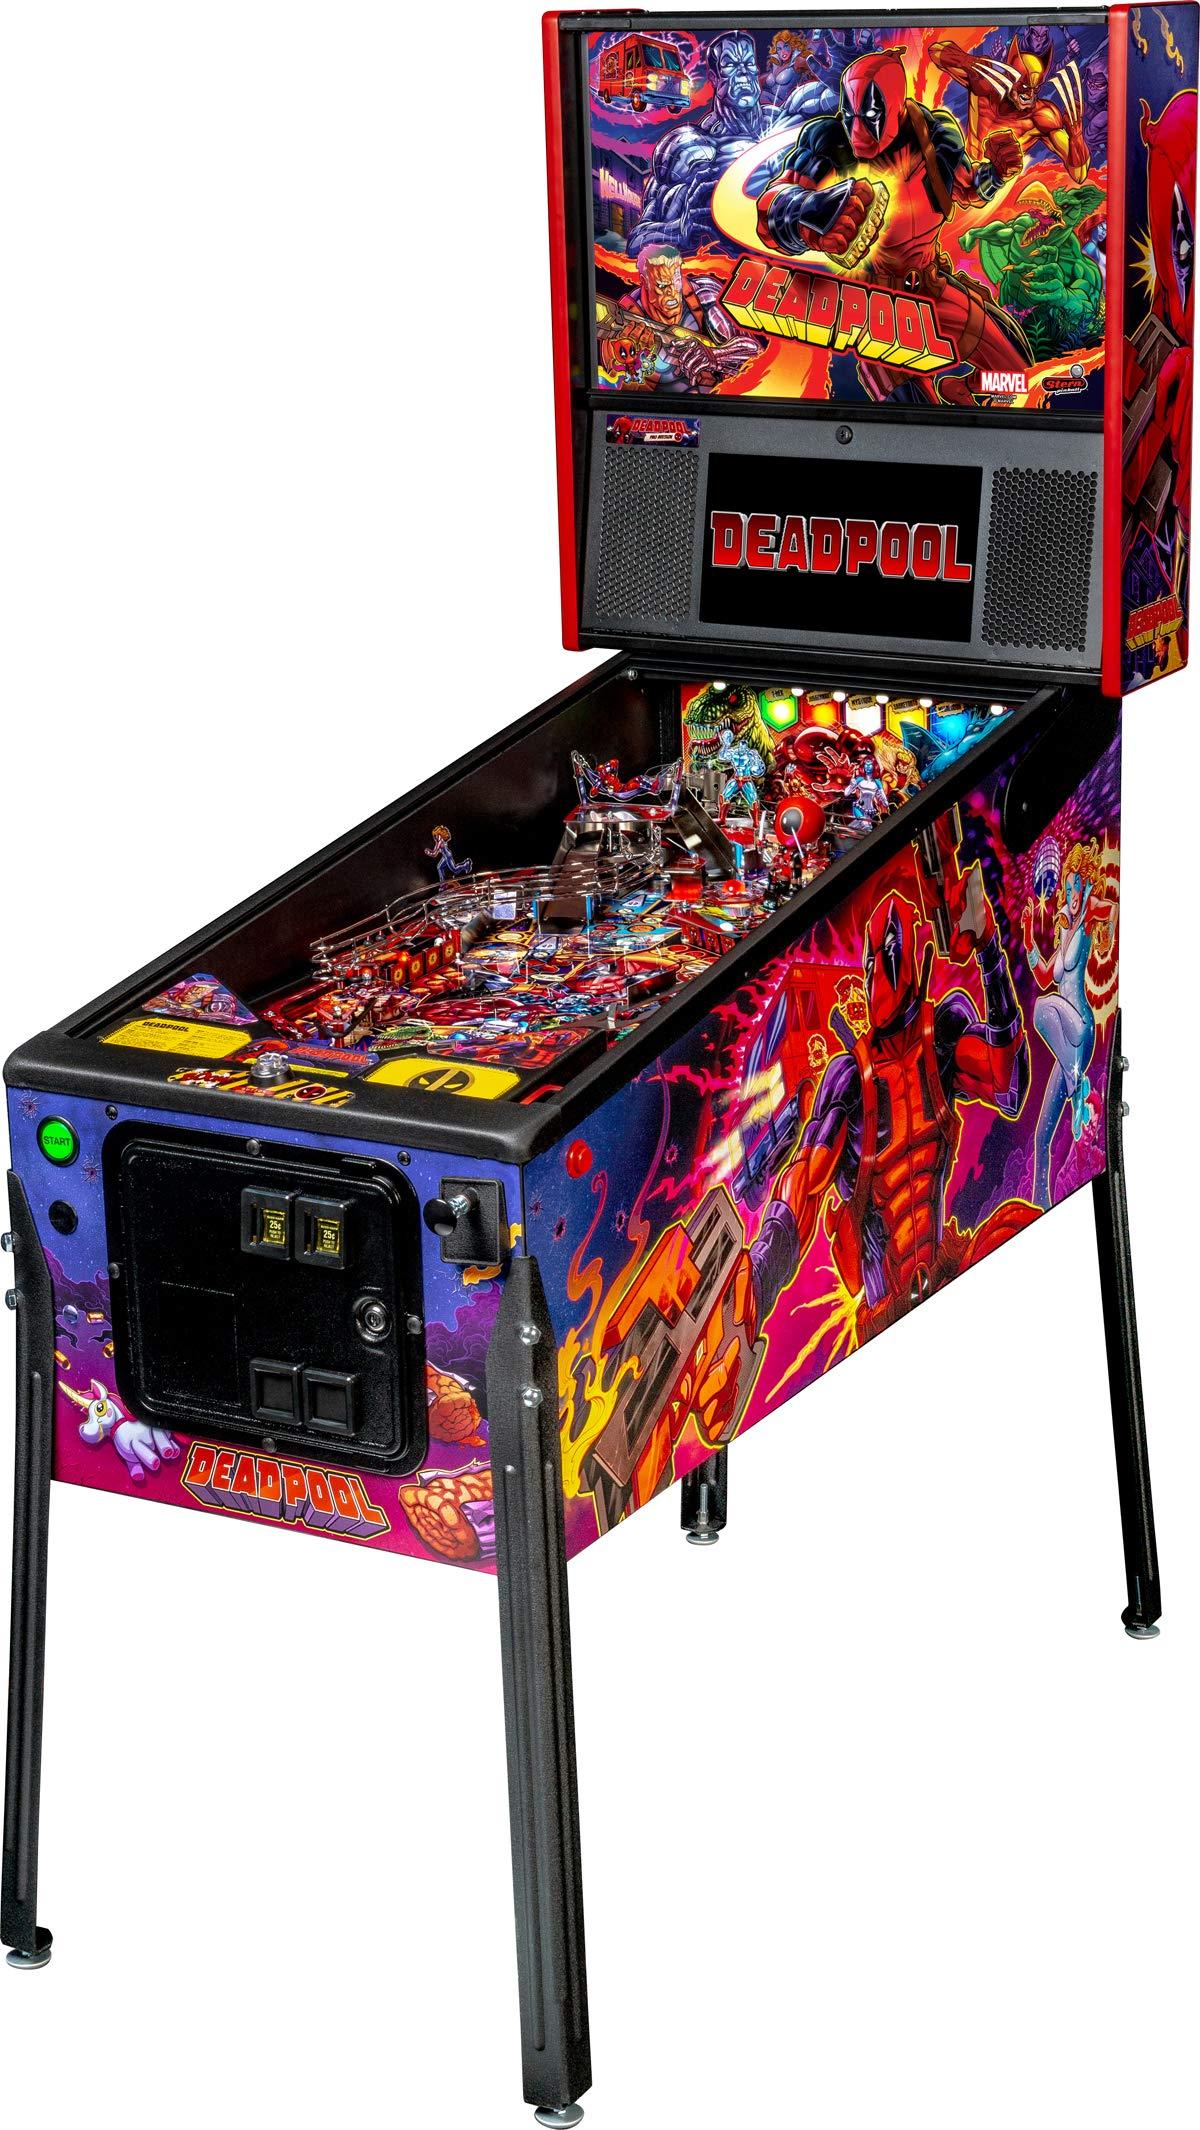 Stern Pinball Deadpool Arcade Pinball Machine, Pro Edition by Stern Pinball